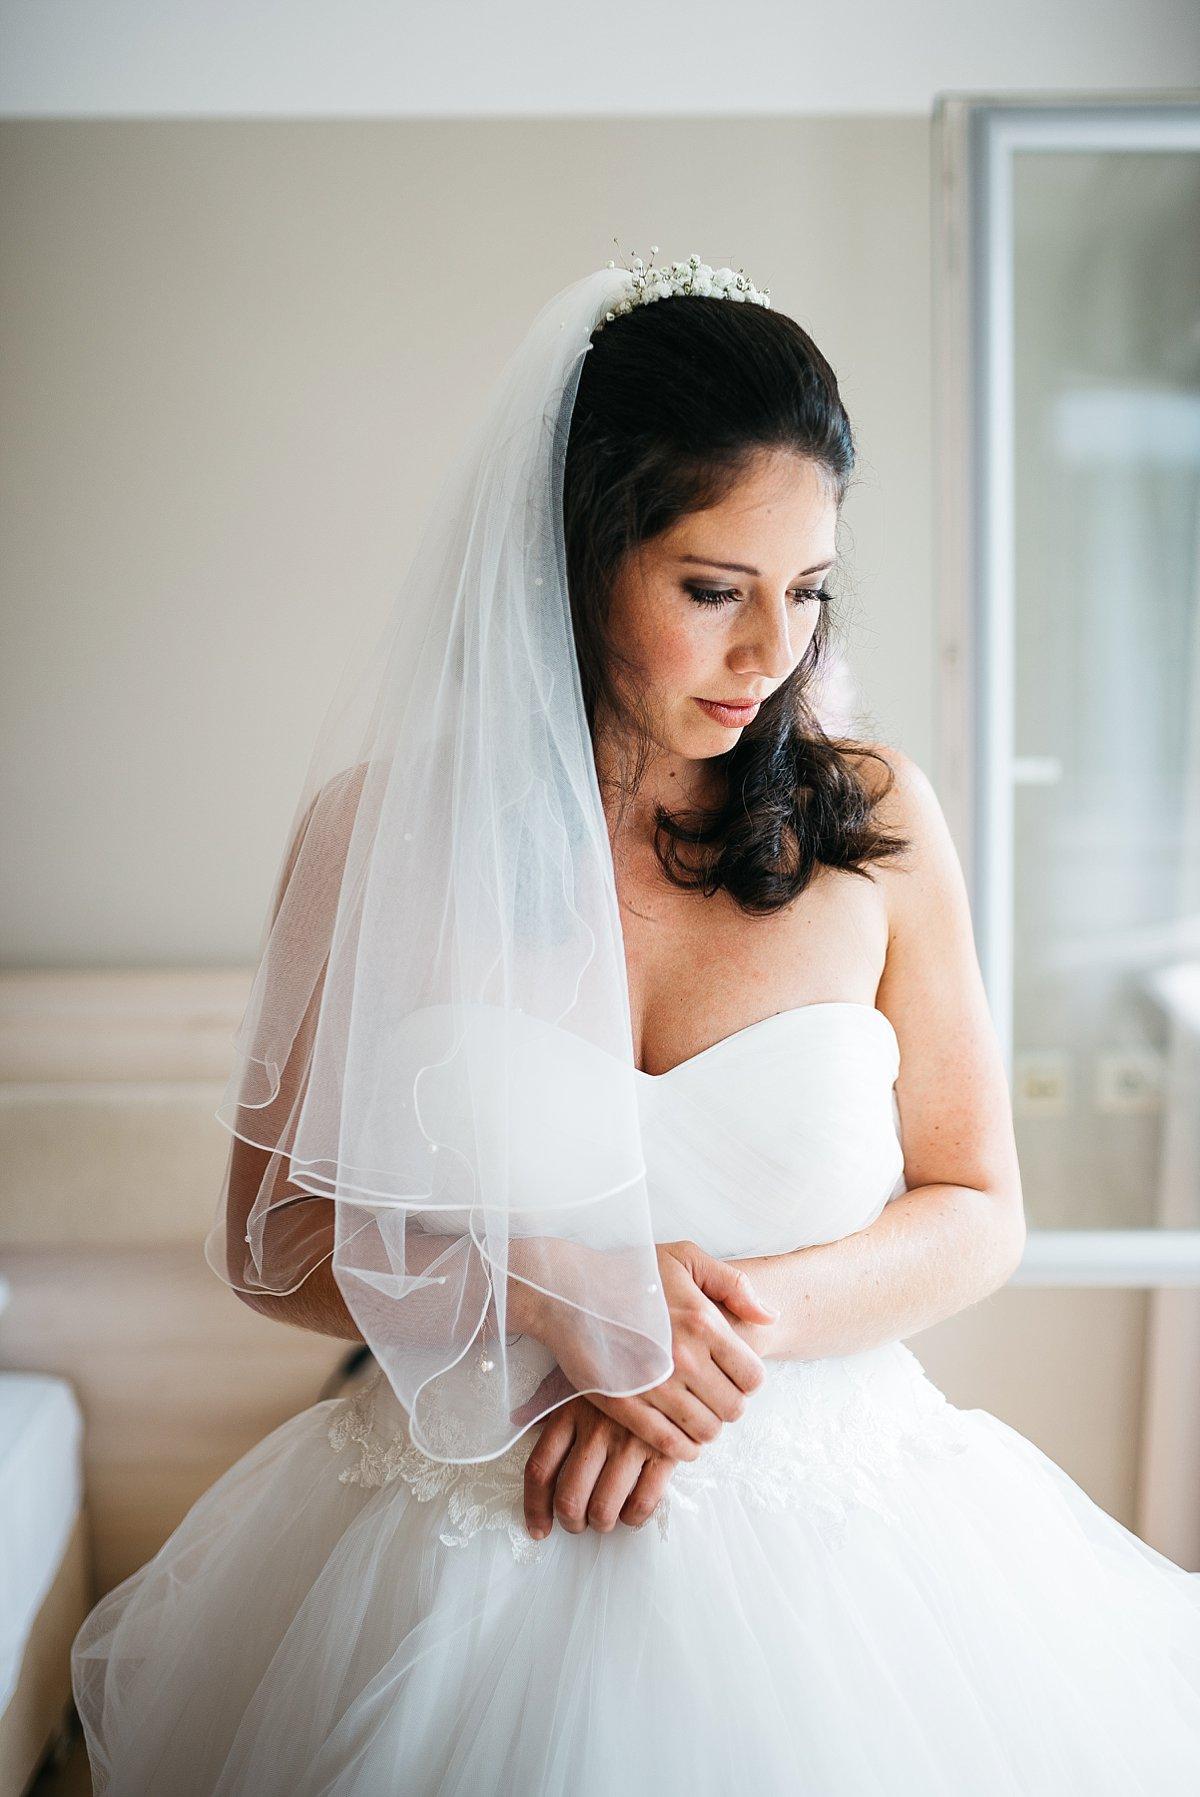 daniel-lopez-perez-wedding-photographer-austria-028